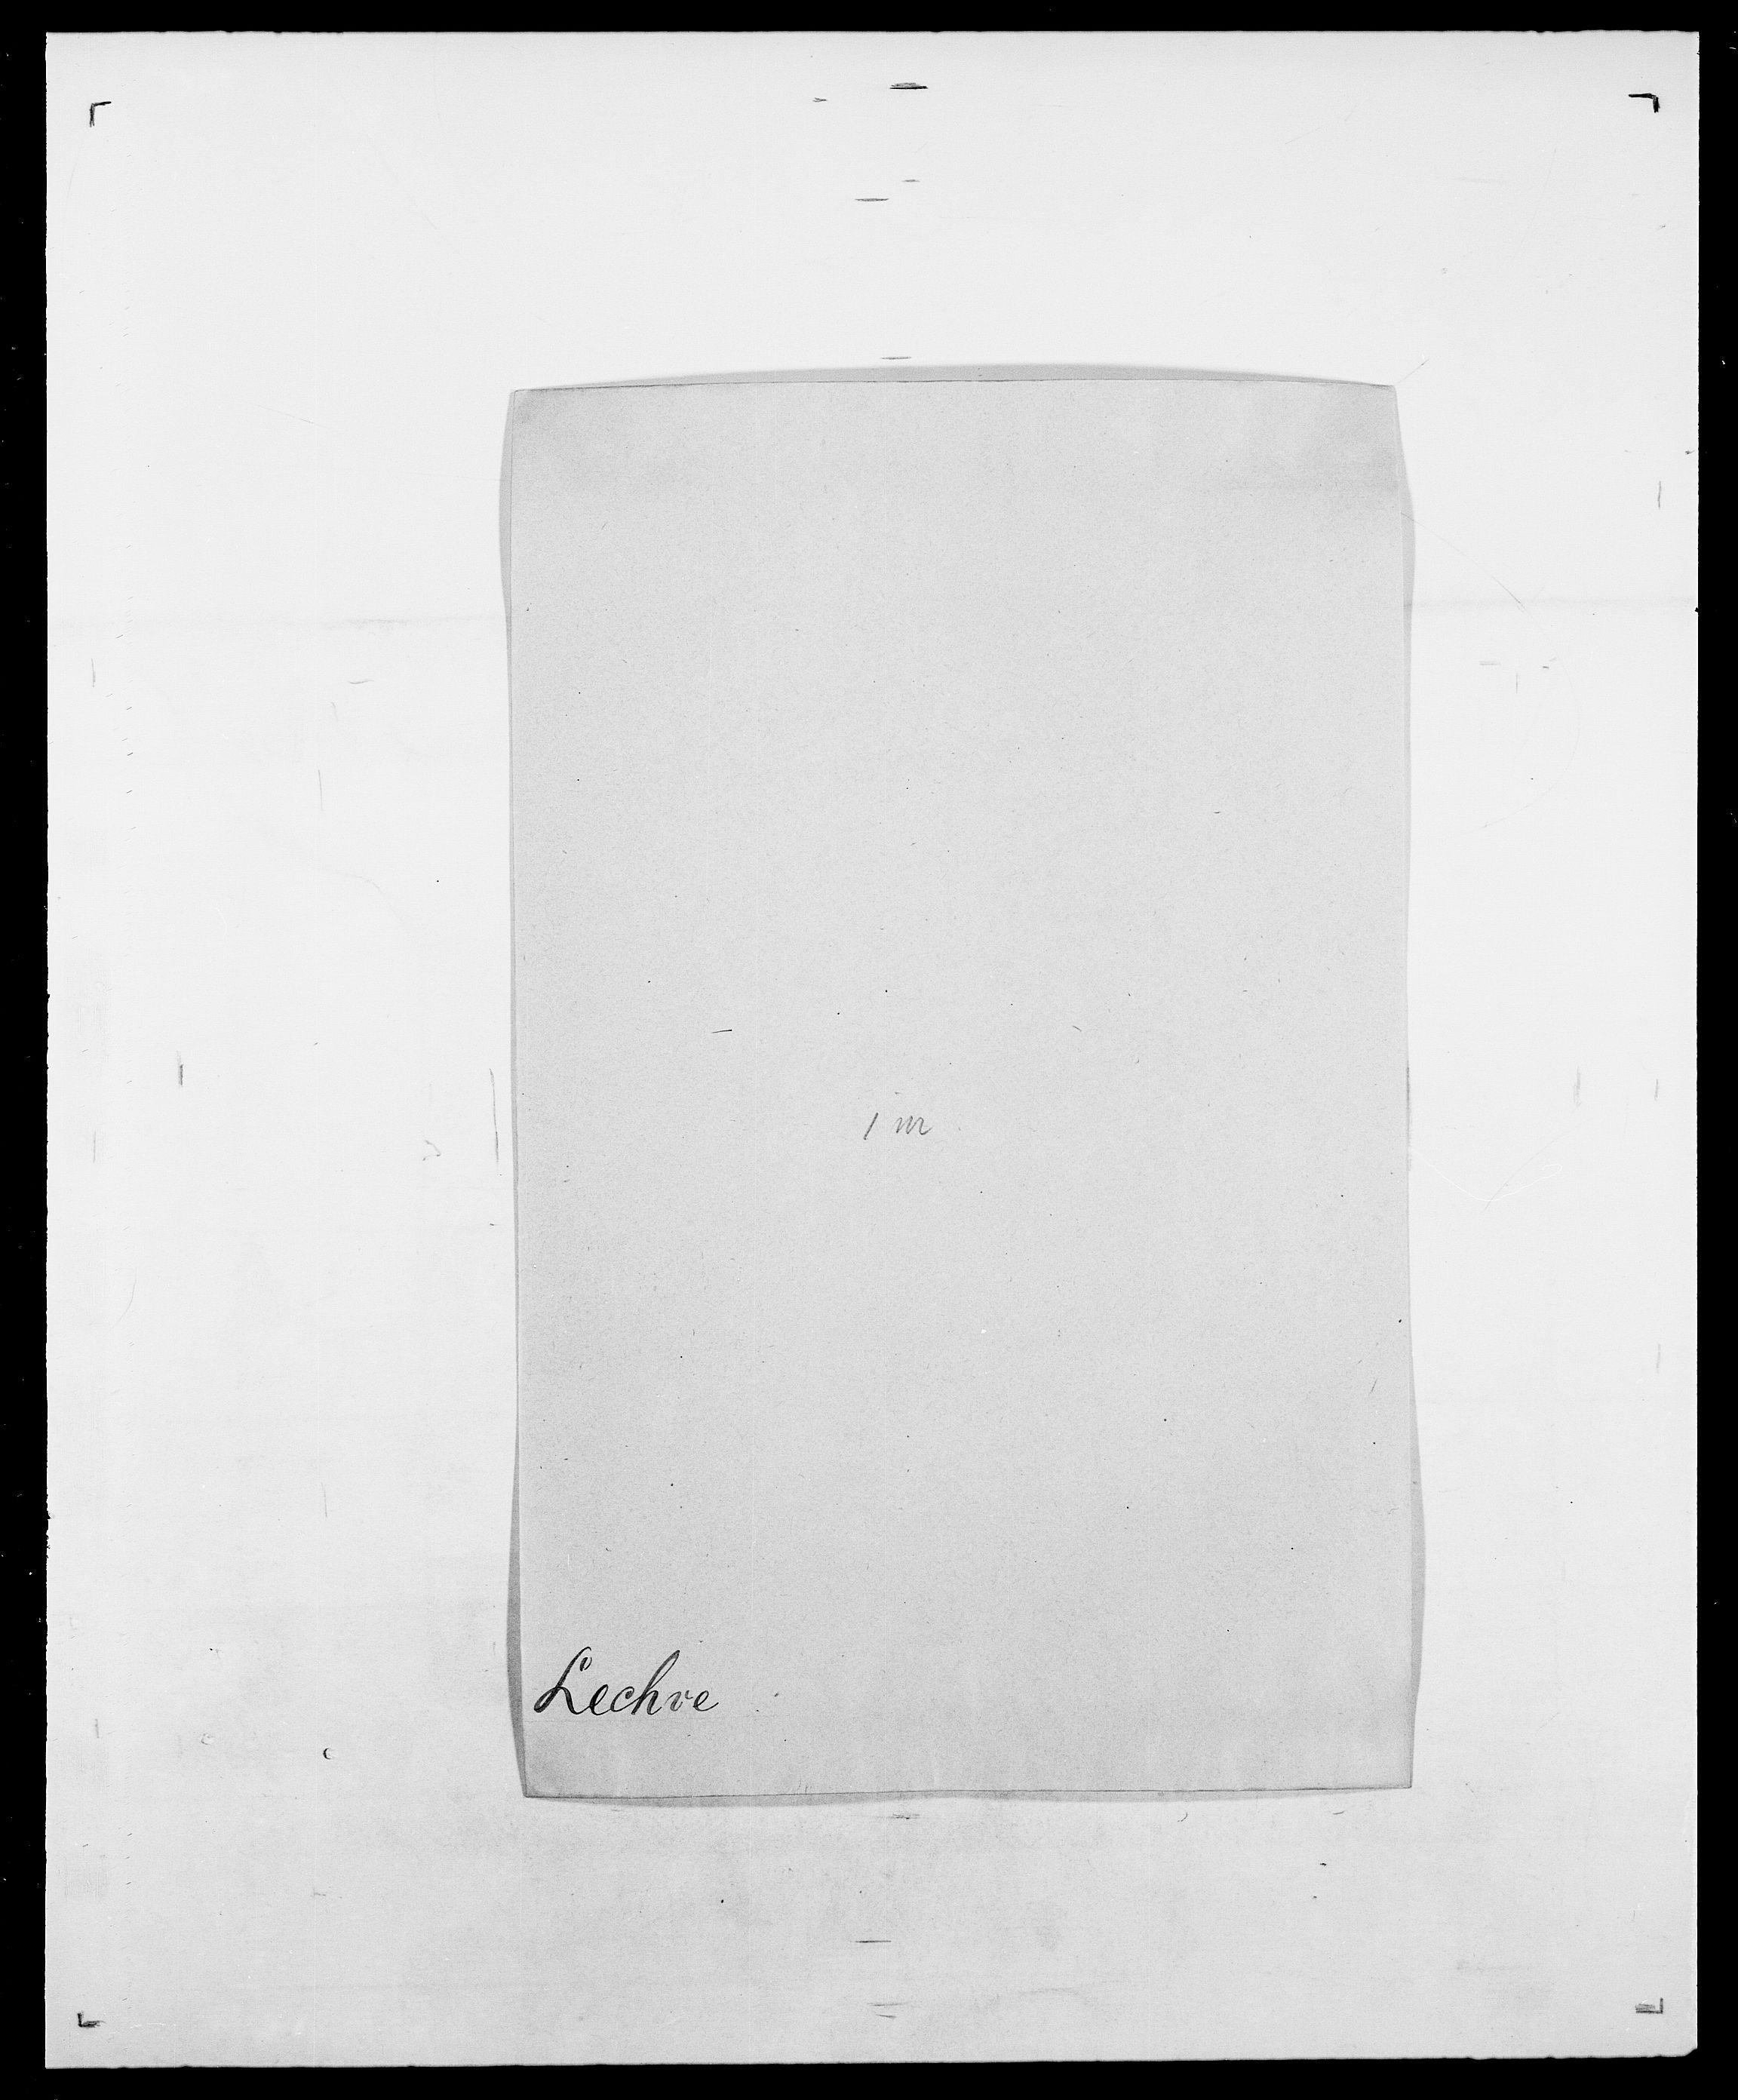 SAO, Delgobe, Charles Antoine - samling, D/Da/L0023: Lau - Lirvyn, s. 53